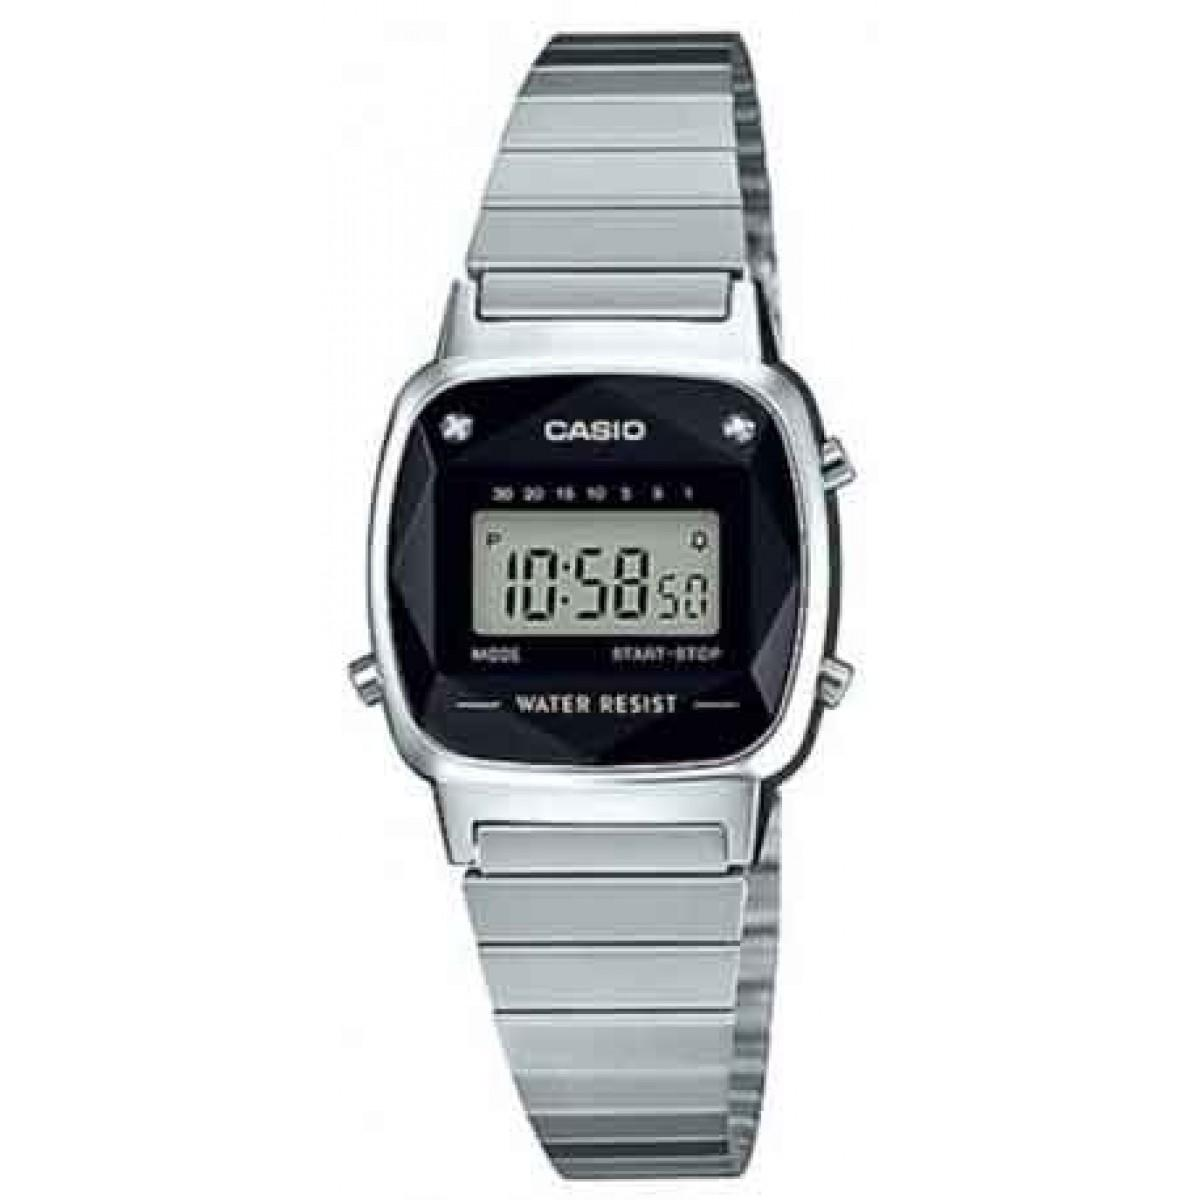 c142711b335 Relógio casio la wad diamante prata retro vintage original vista adicionar  sacola jpg 1200x1200 Relogio casio